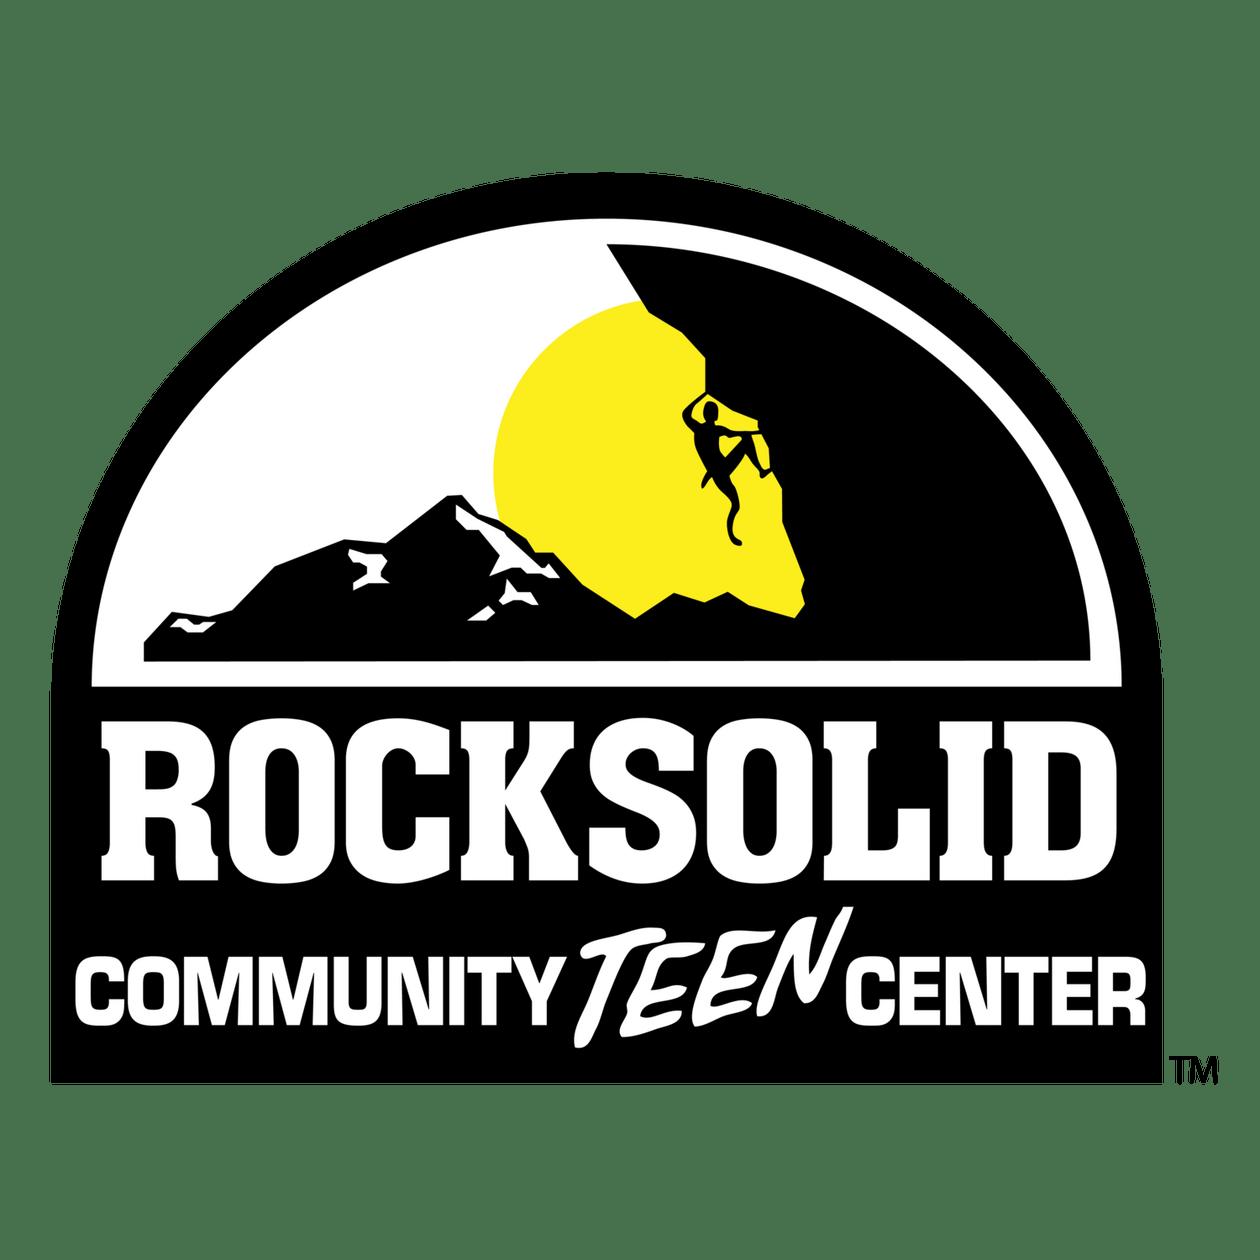 rocksolid+logo-01 (1)